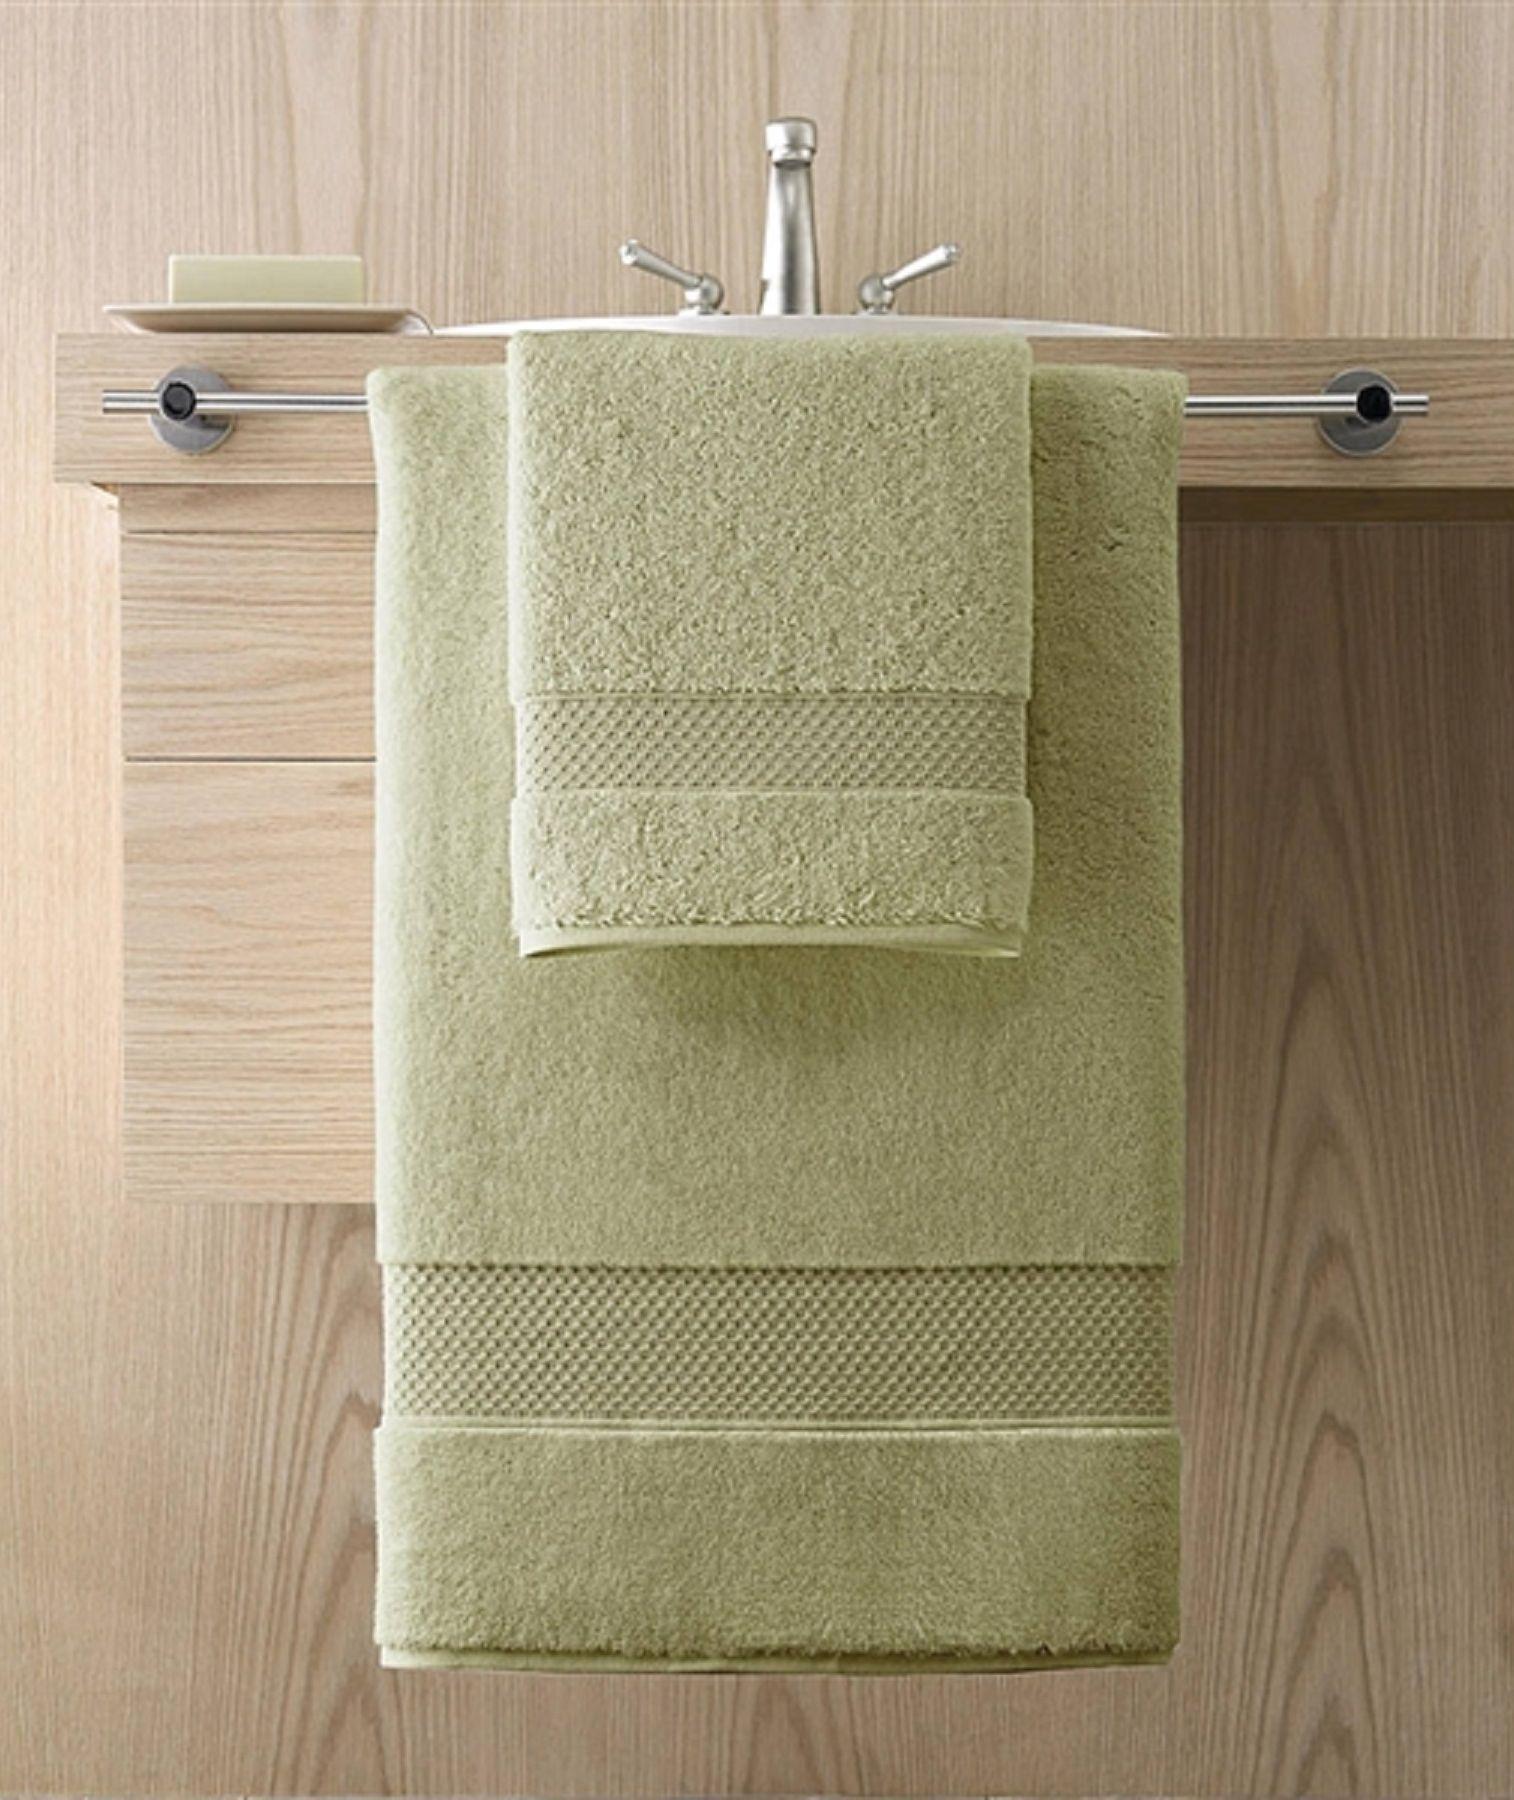 Коврики для ванной Банный коврик 51x86 Kassatex Elegance Thyme elitnyy-bannyy-kovrik-elegance-thyme-ot-kassatex-portugaliya.jpg